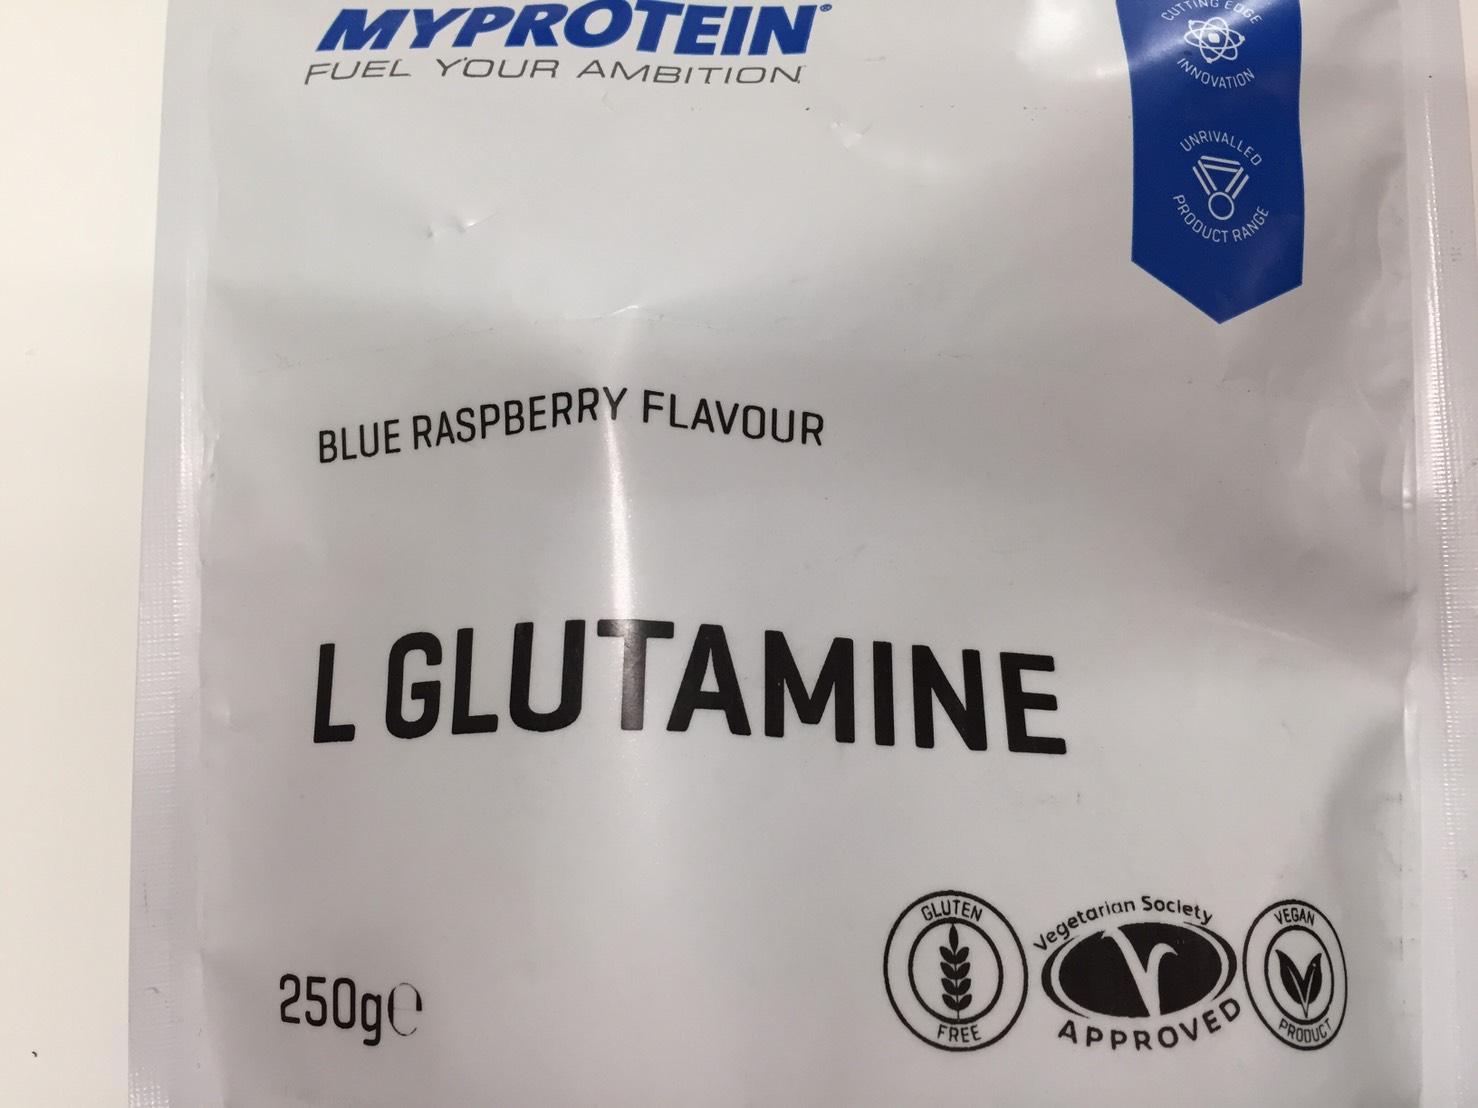 L-グルタミン「BLUE RASPBERRY FLAVOUR(ブルーラズベリー味)」